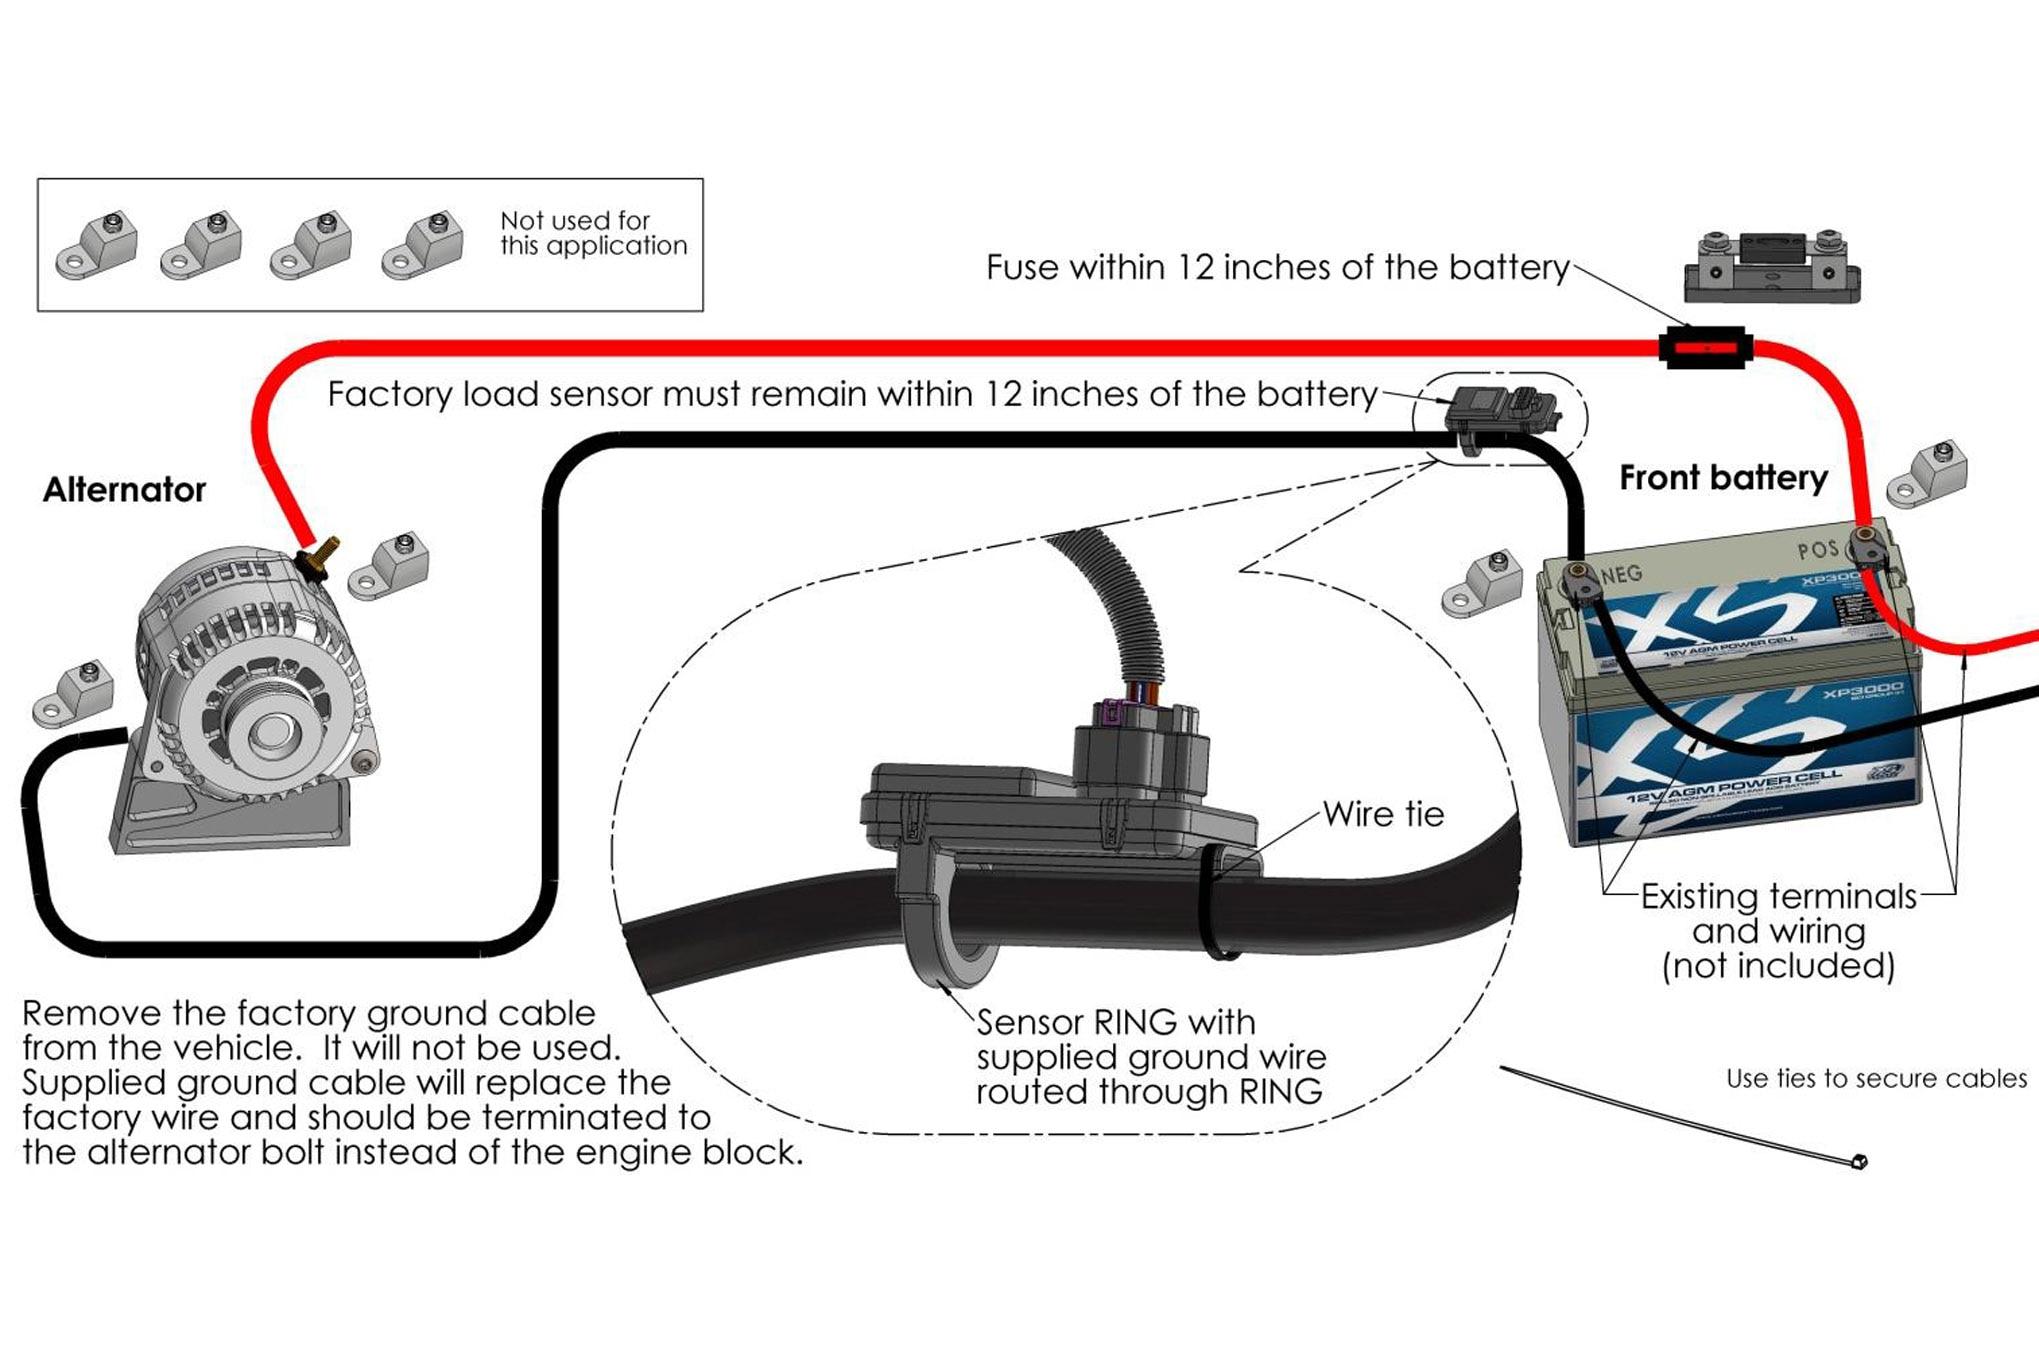 One Wire Alternator Wiring Diagram On Elect Diagram 1986 Corvette